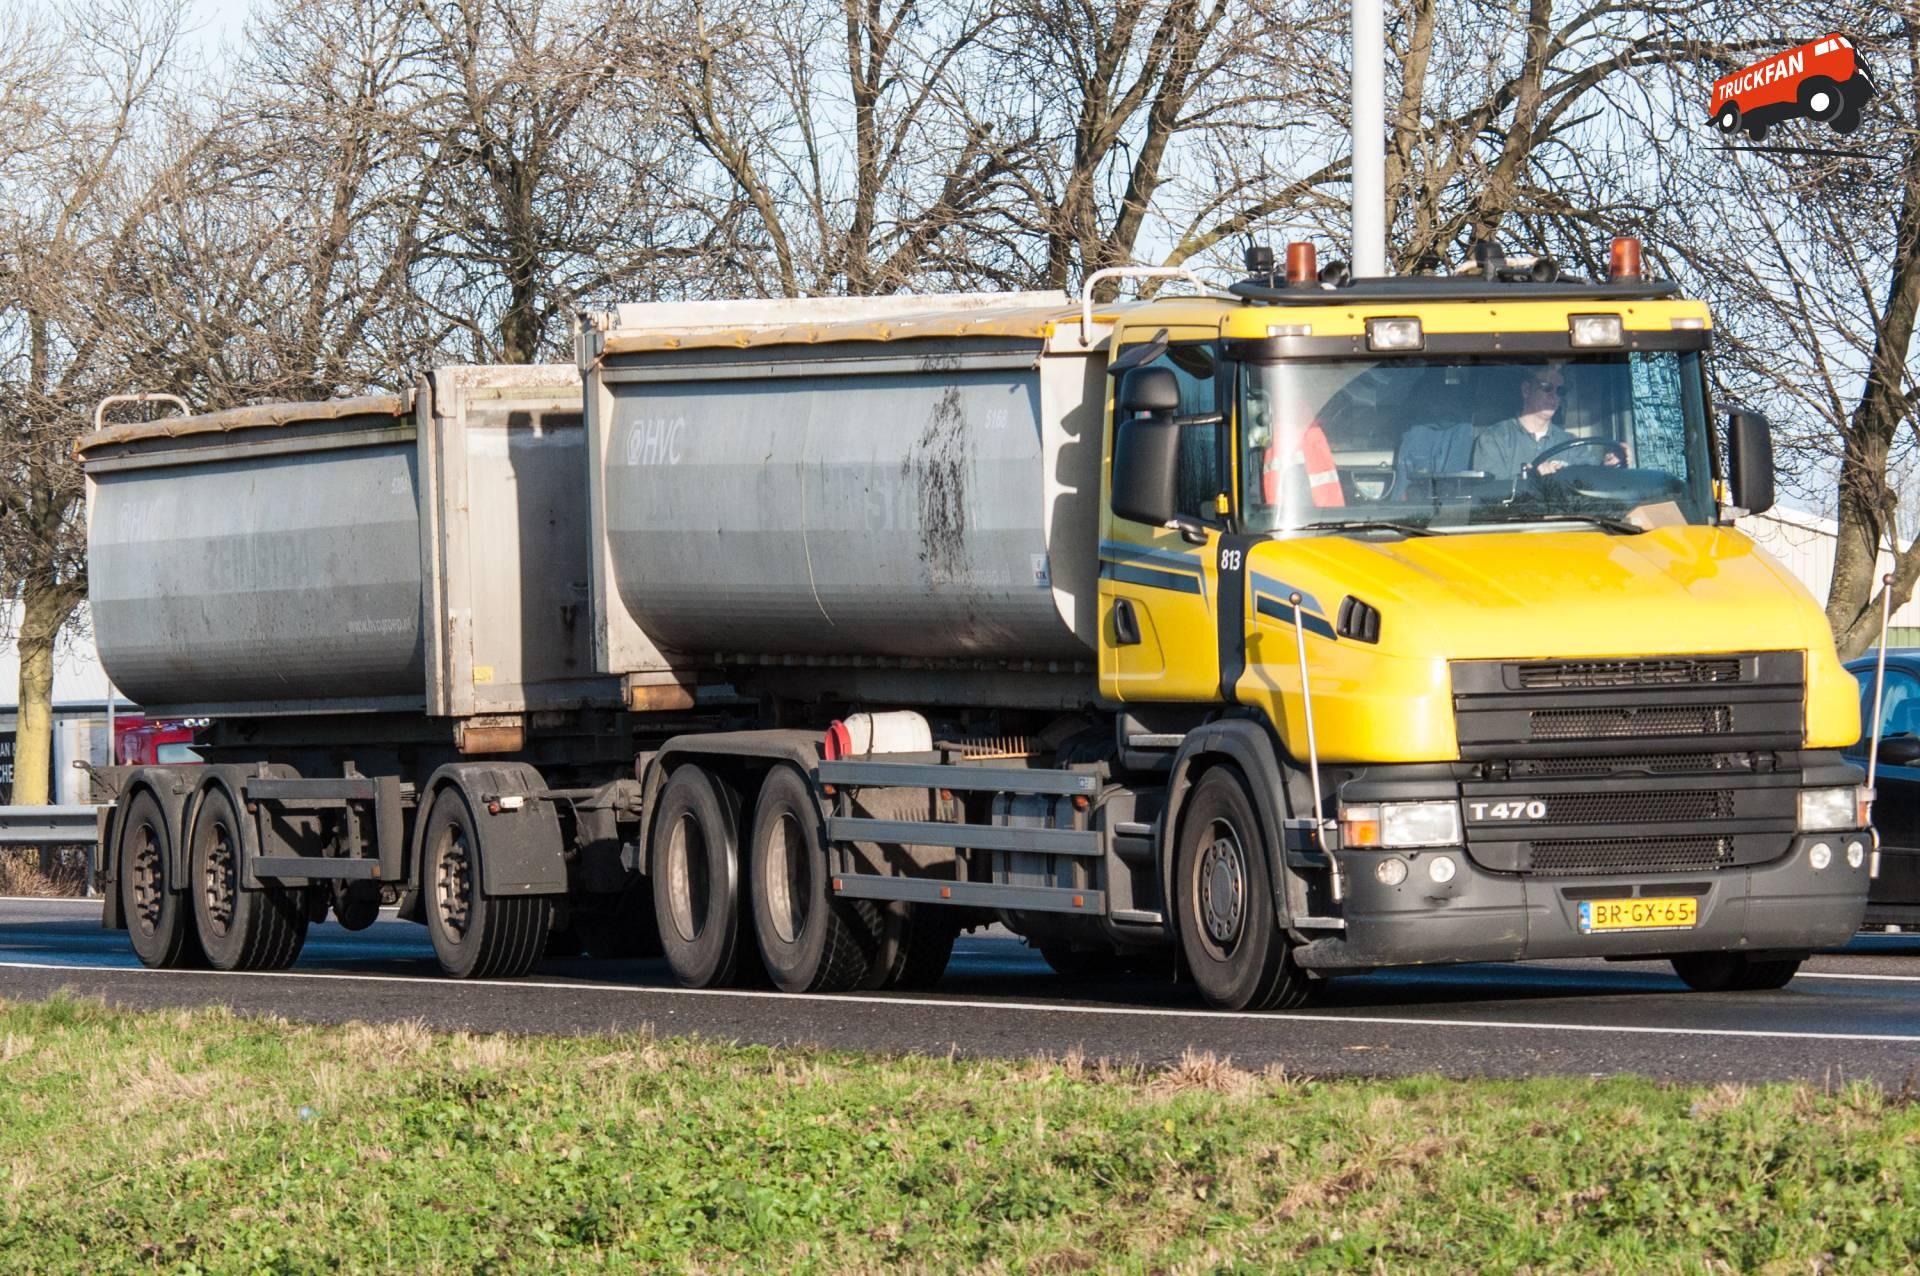 Scania T470